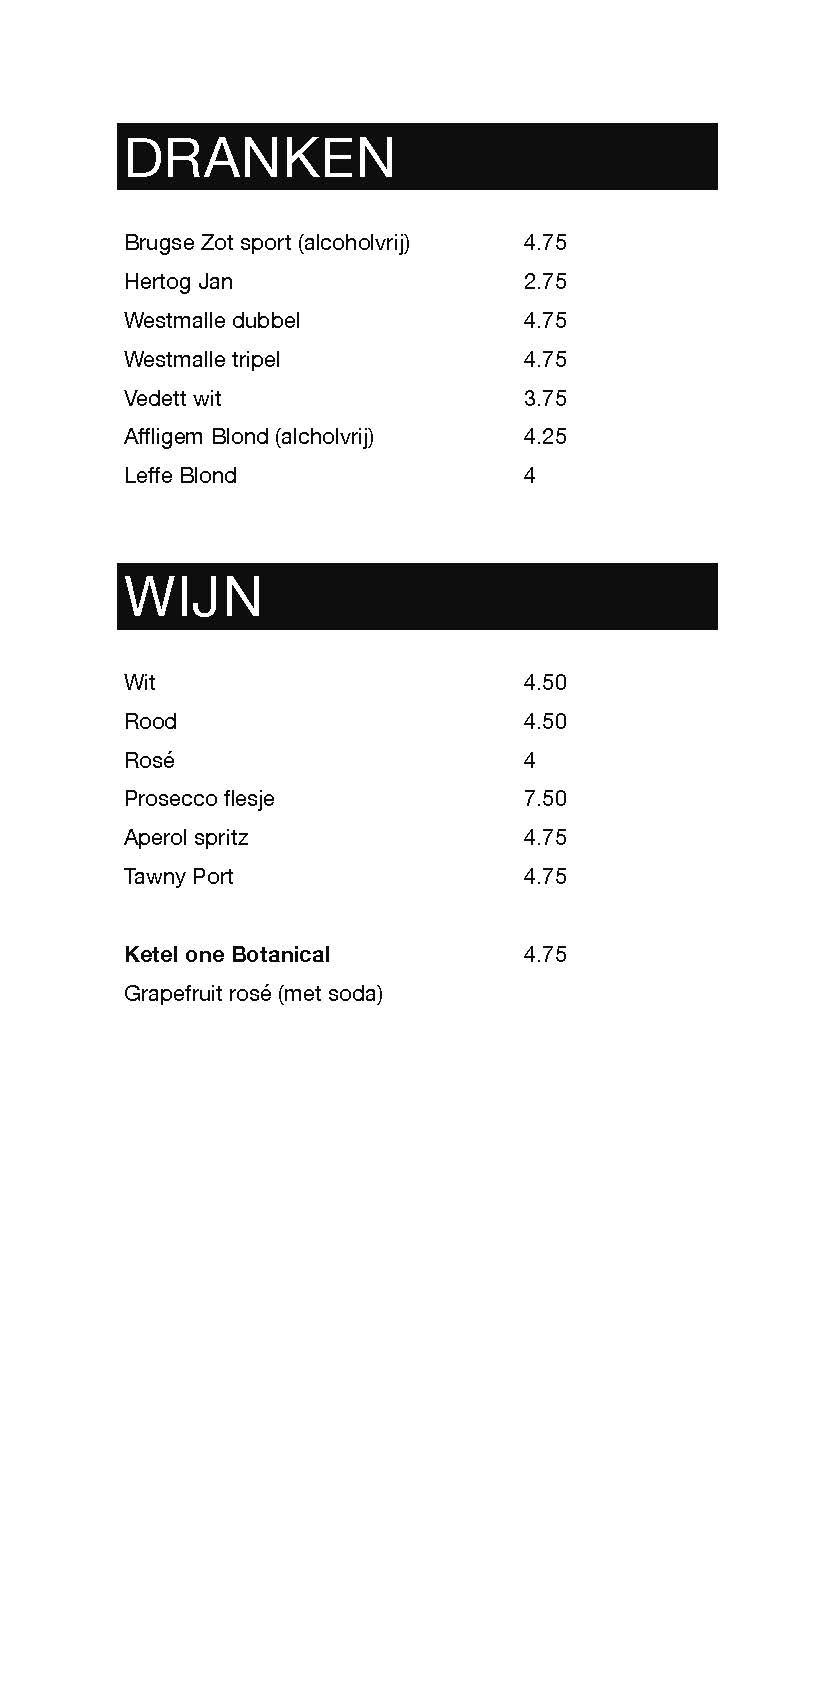 menukaart 2020 drukgereed losse pagines_Pagina_9